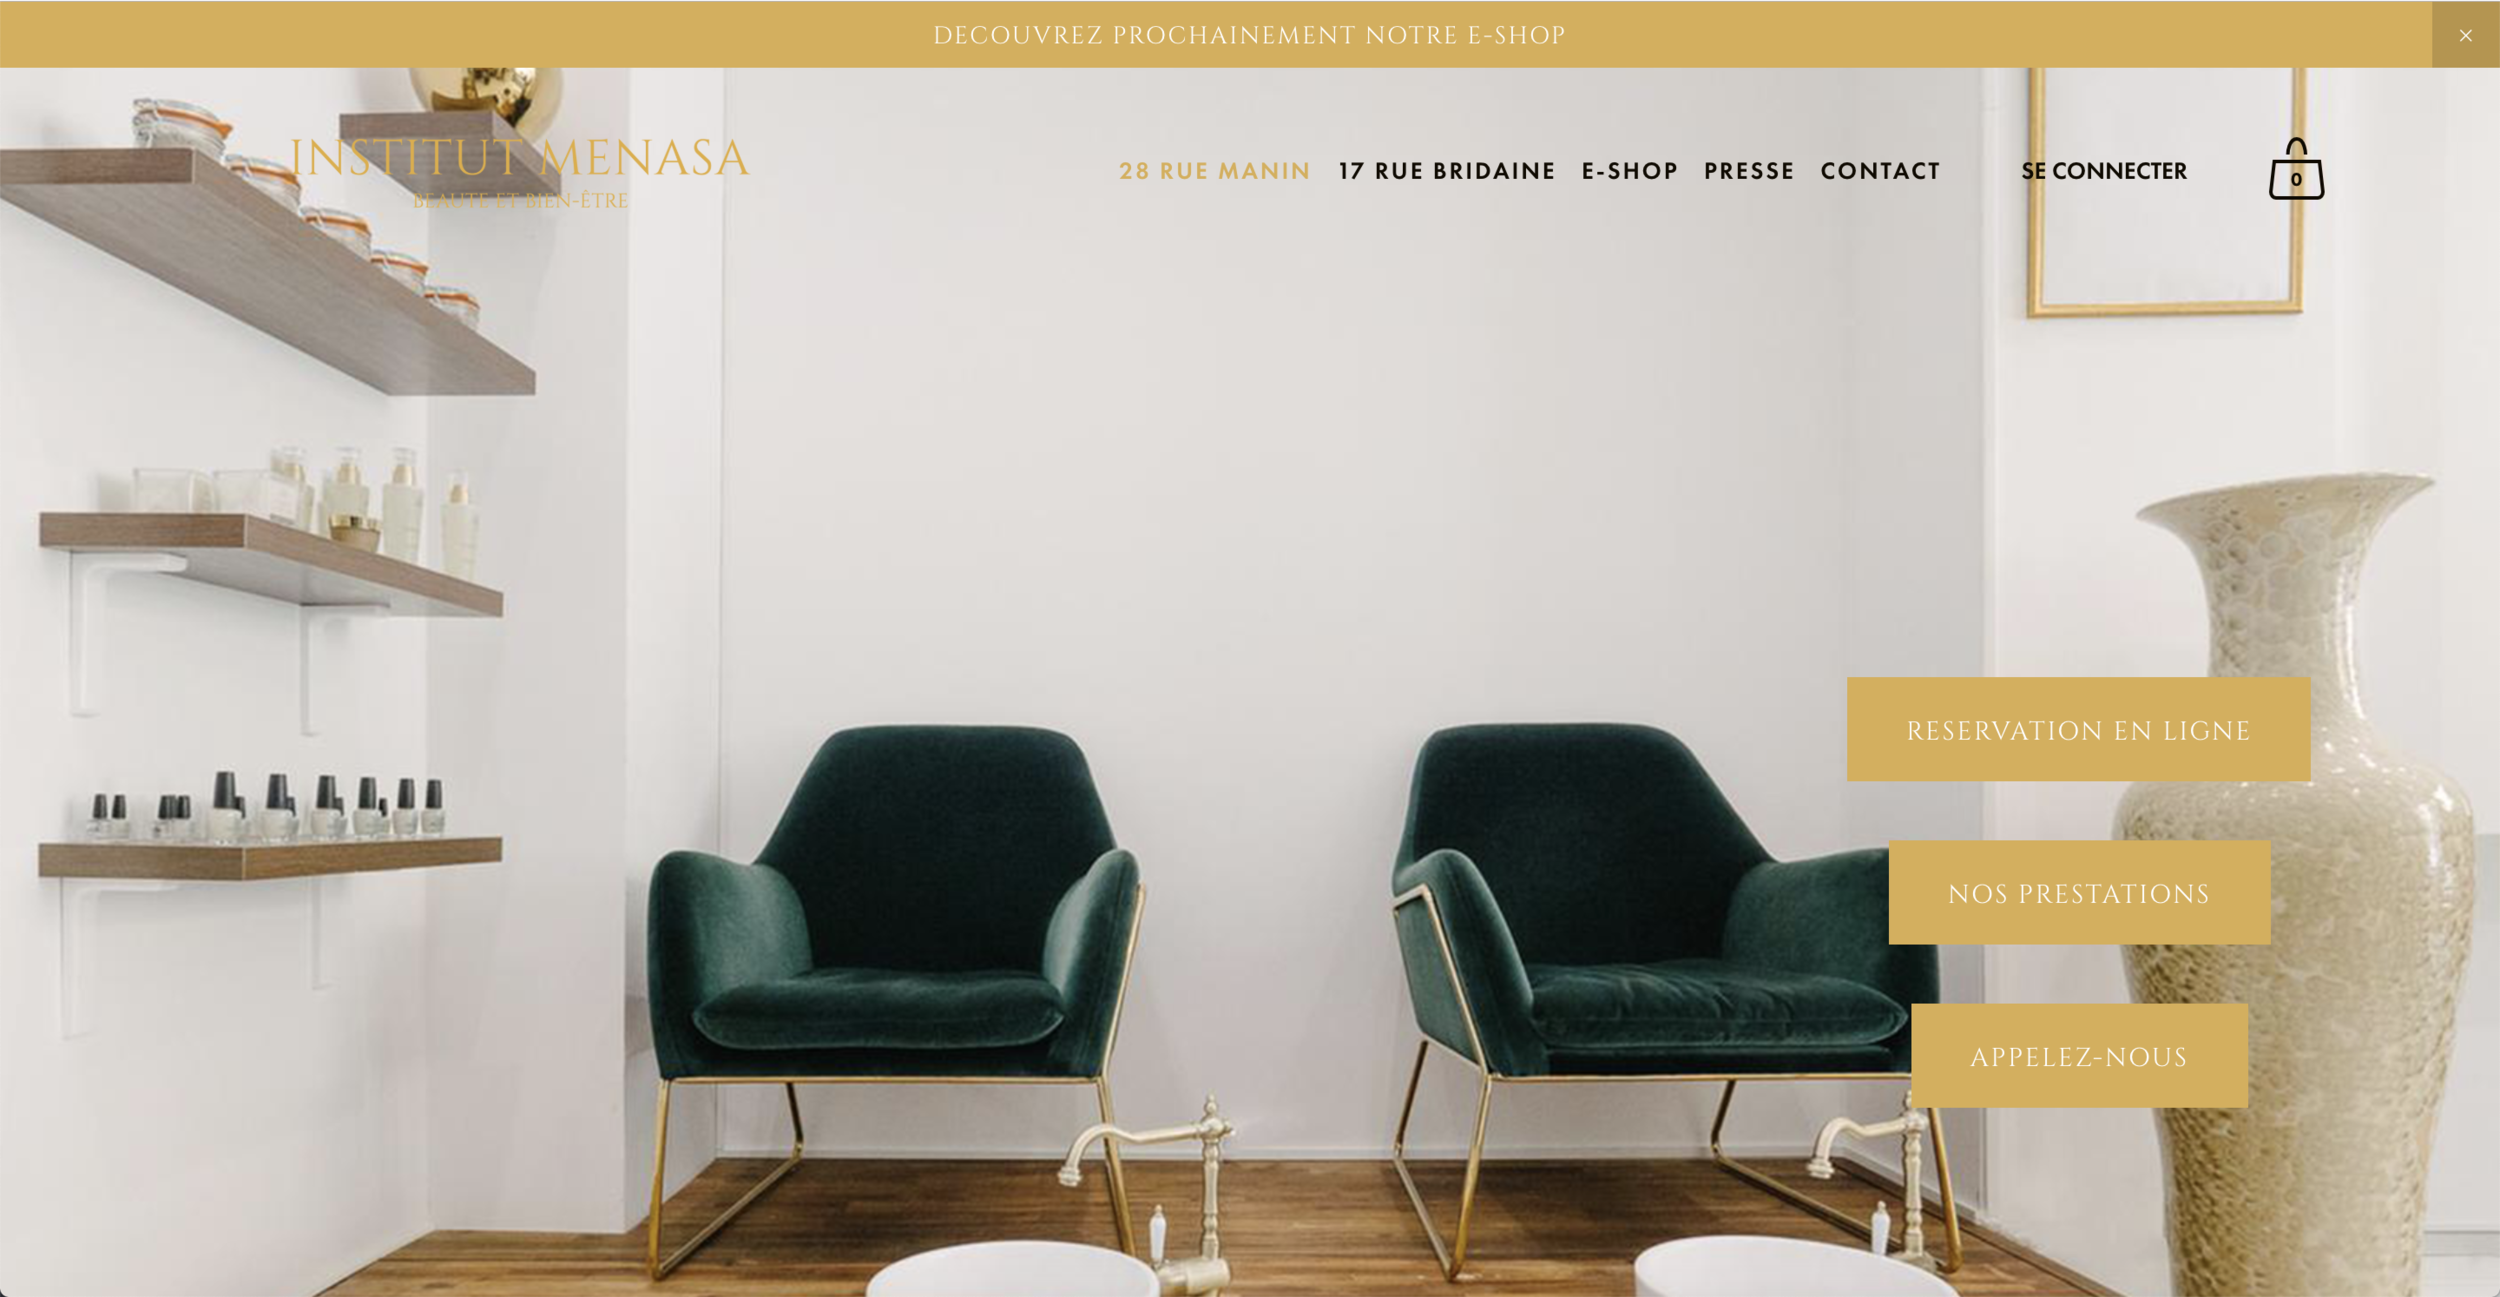 Institut Menasa by agenceayoa